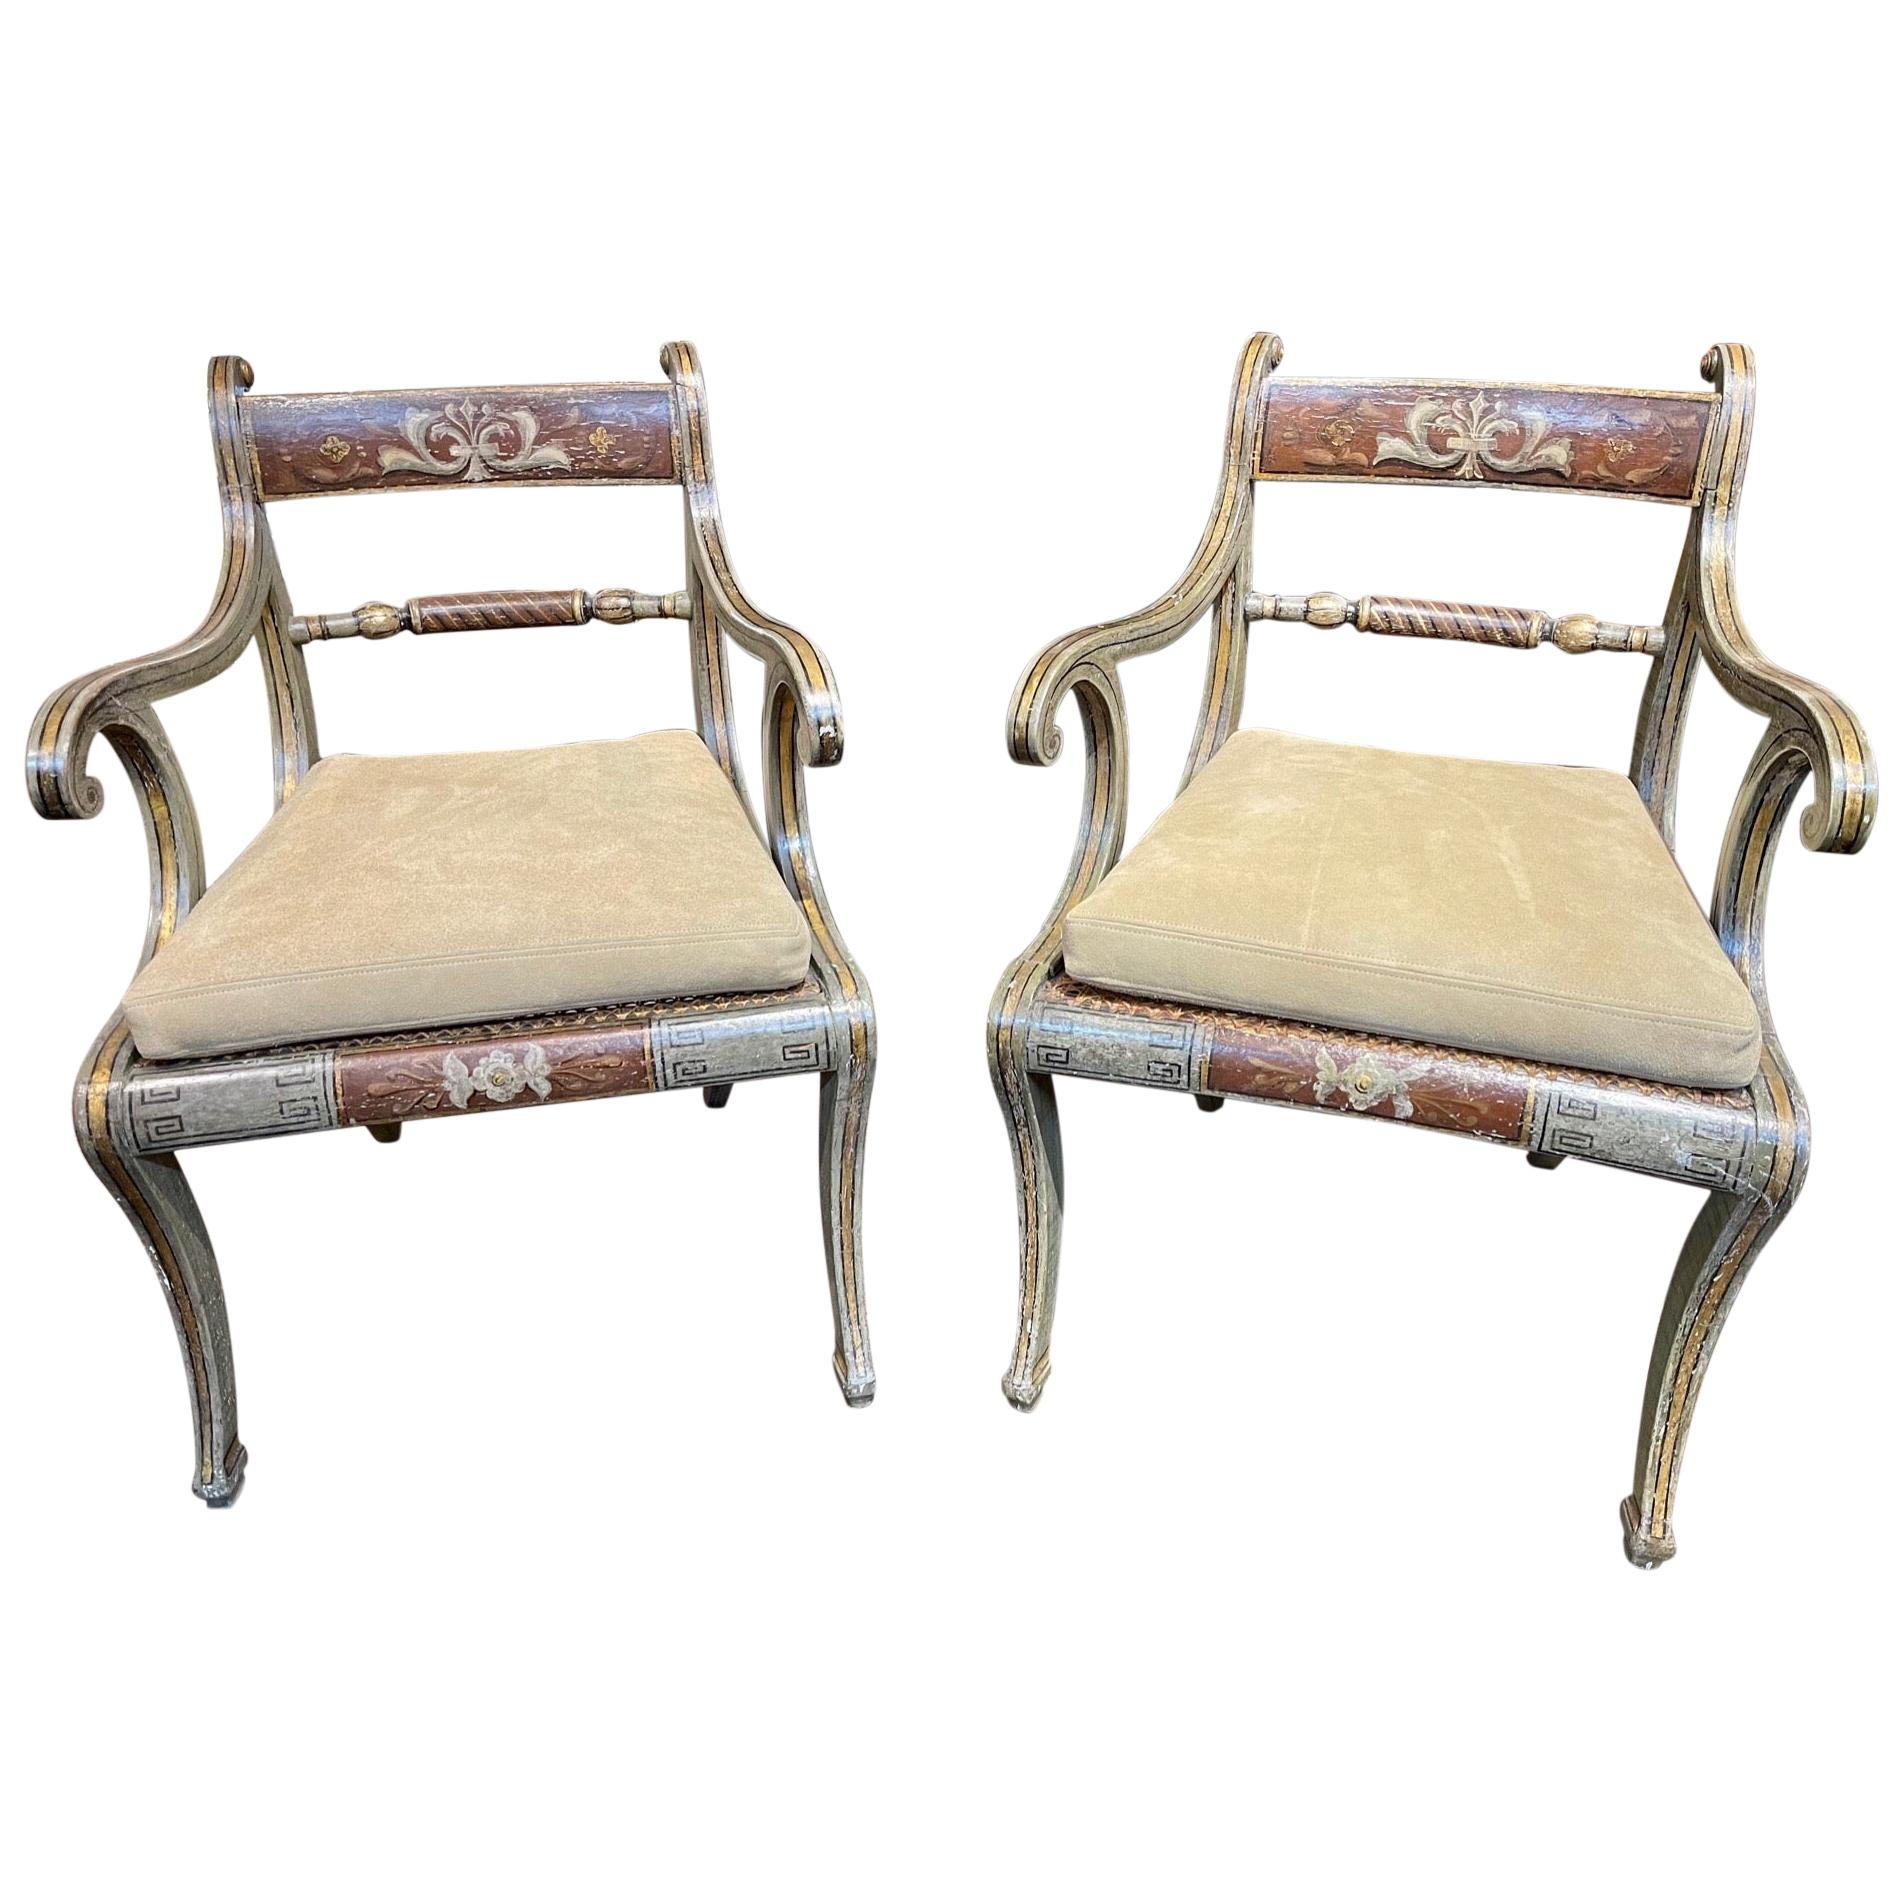 Pair of 19th Century Italian Painted Regency Style Armchairs